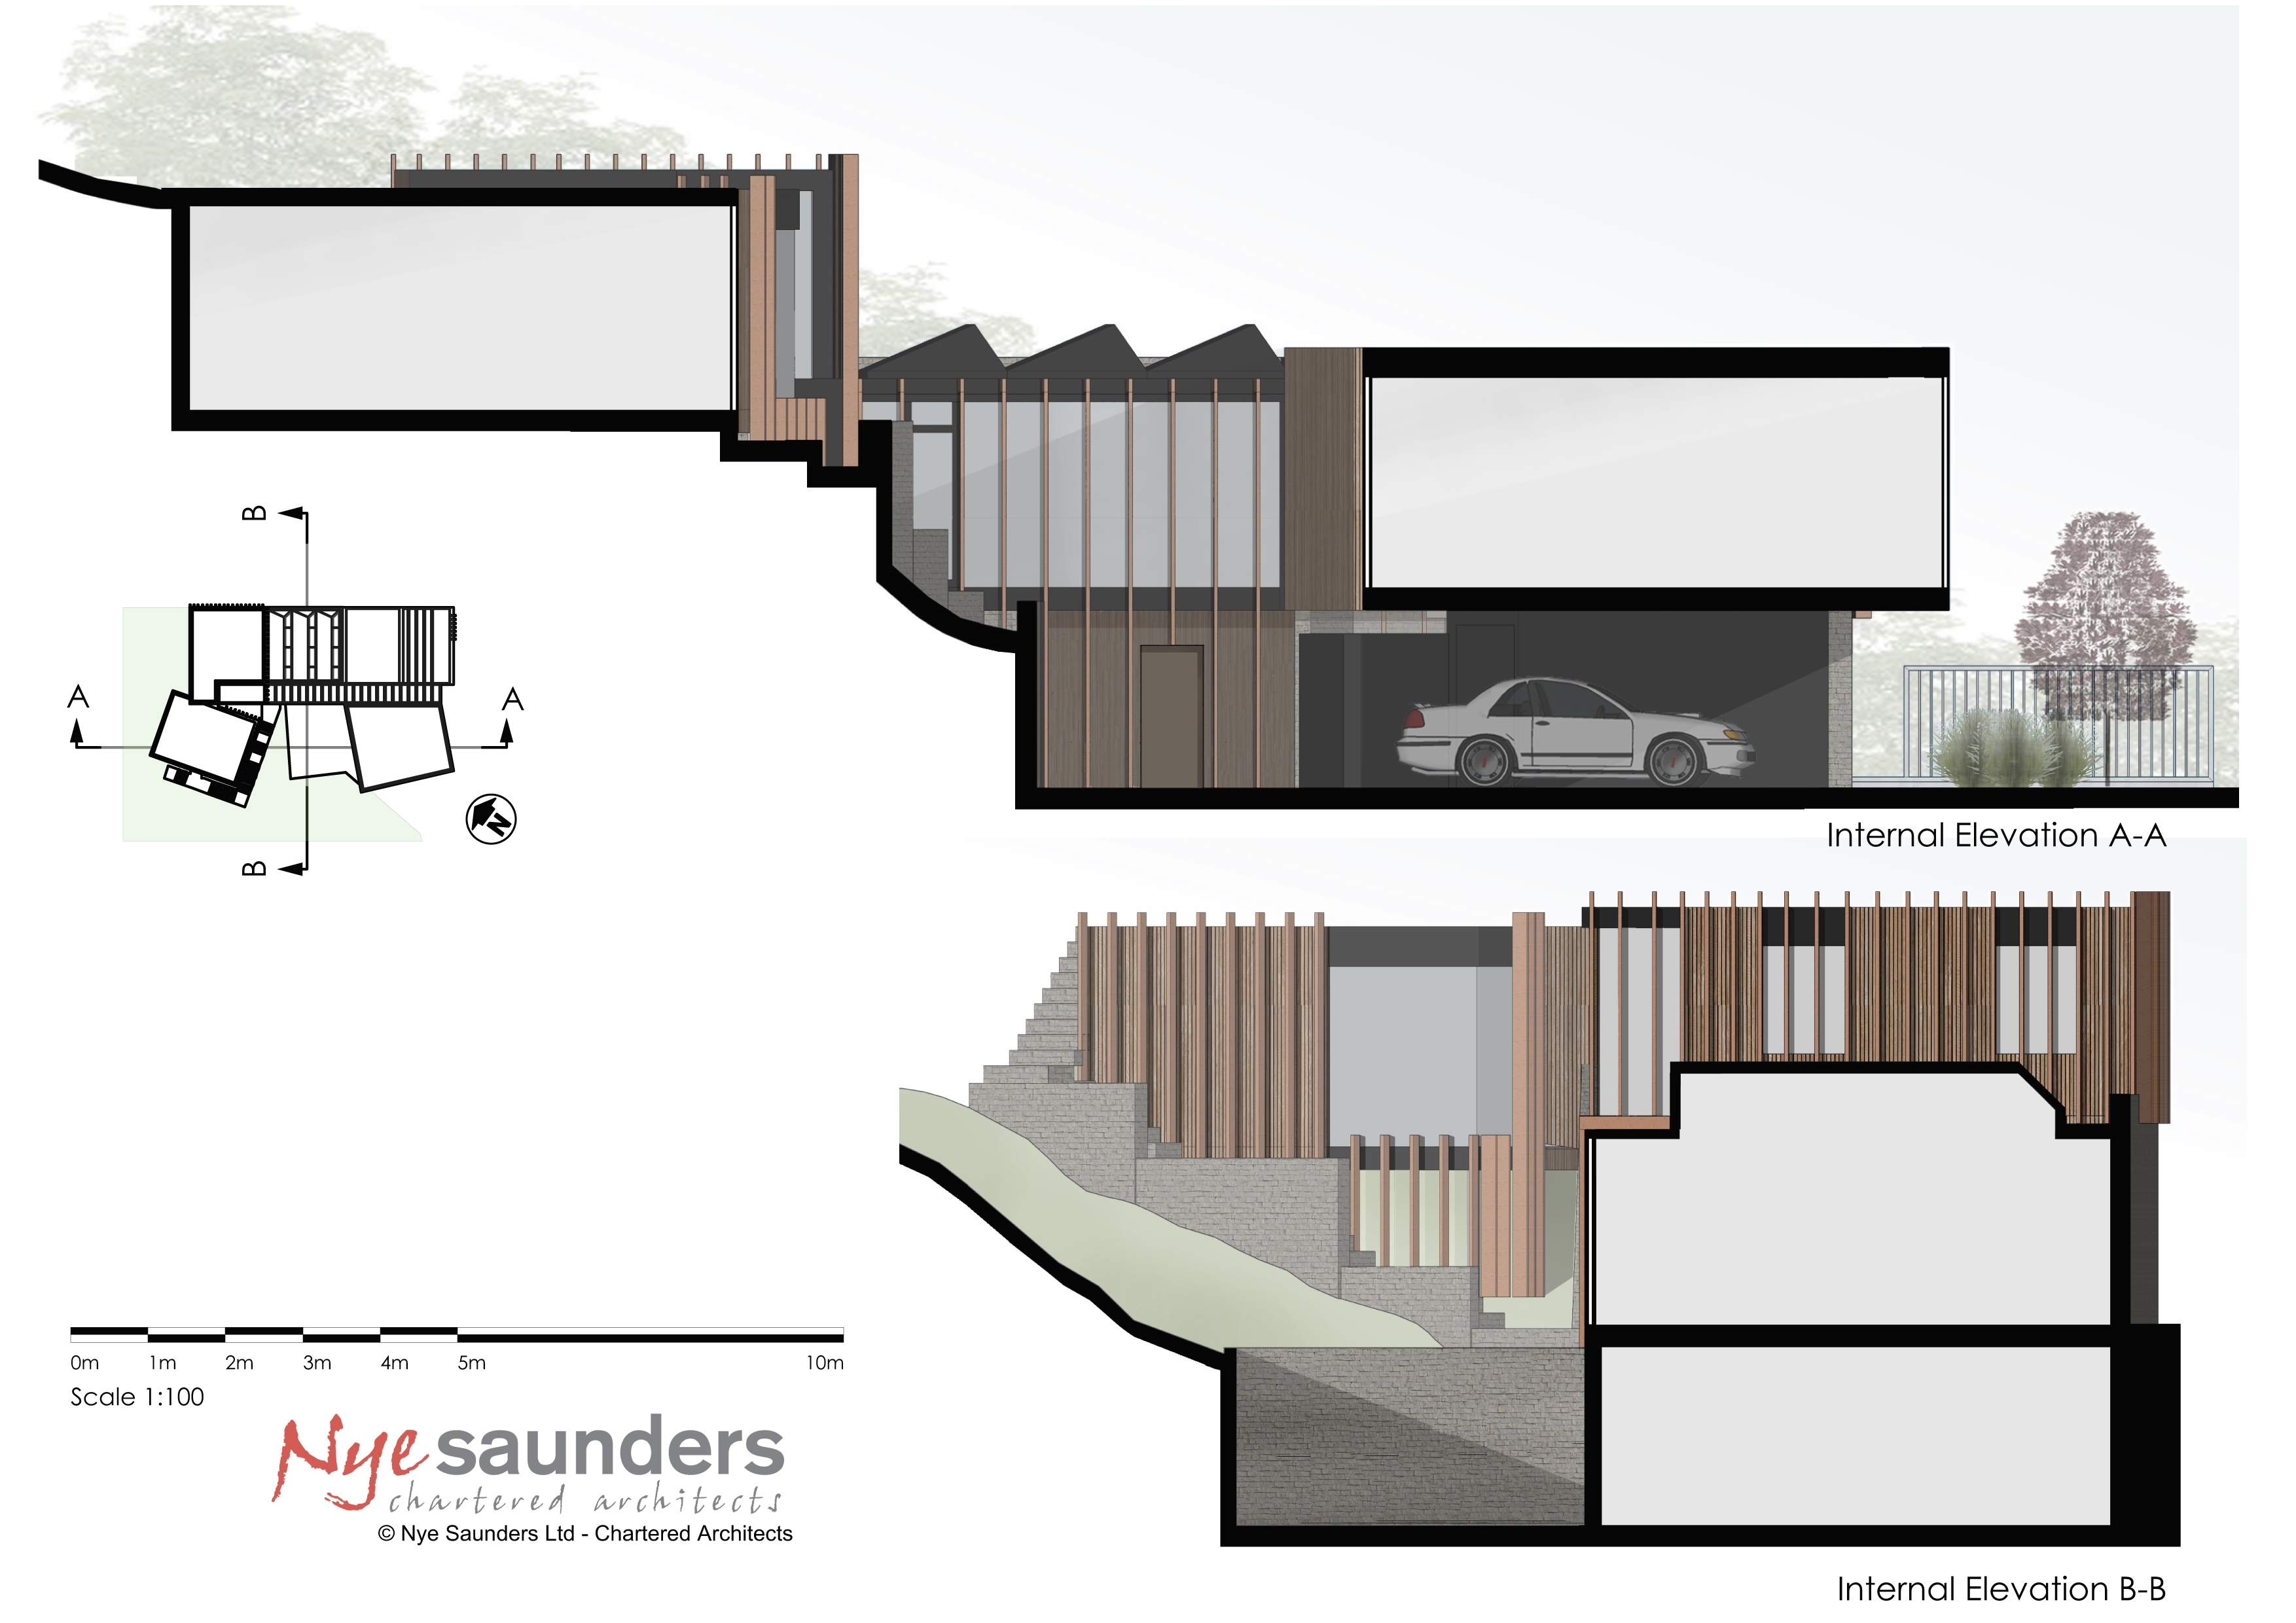 Godalming, Nye Saunders